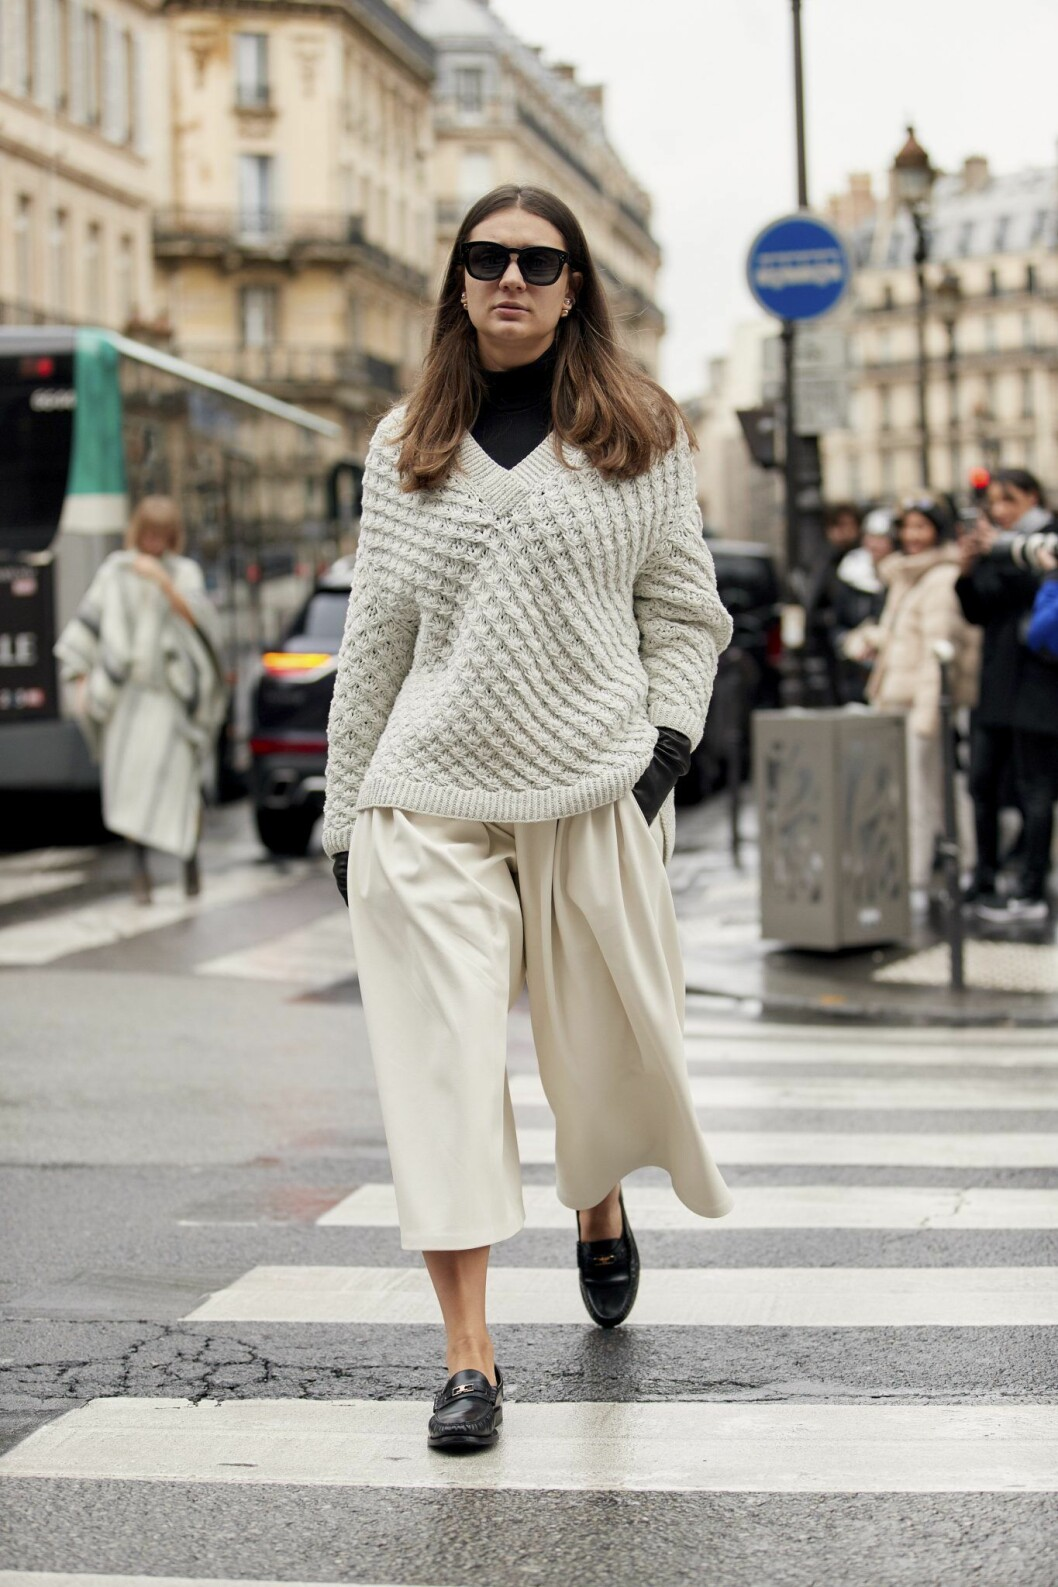 Svart polotröja och vit stickad look Streetstyle Paris Fashion Week AW20.